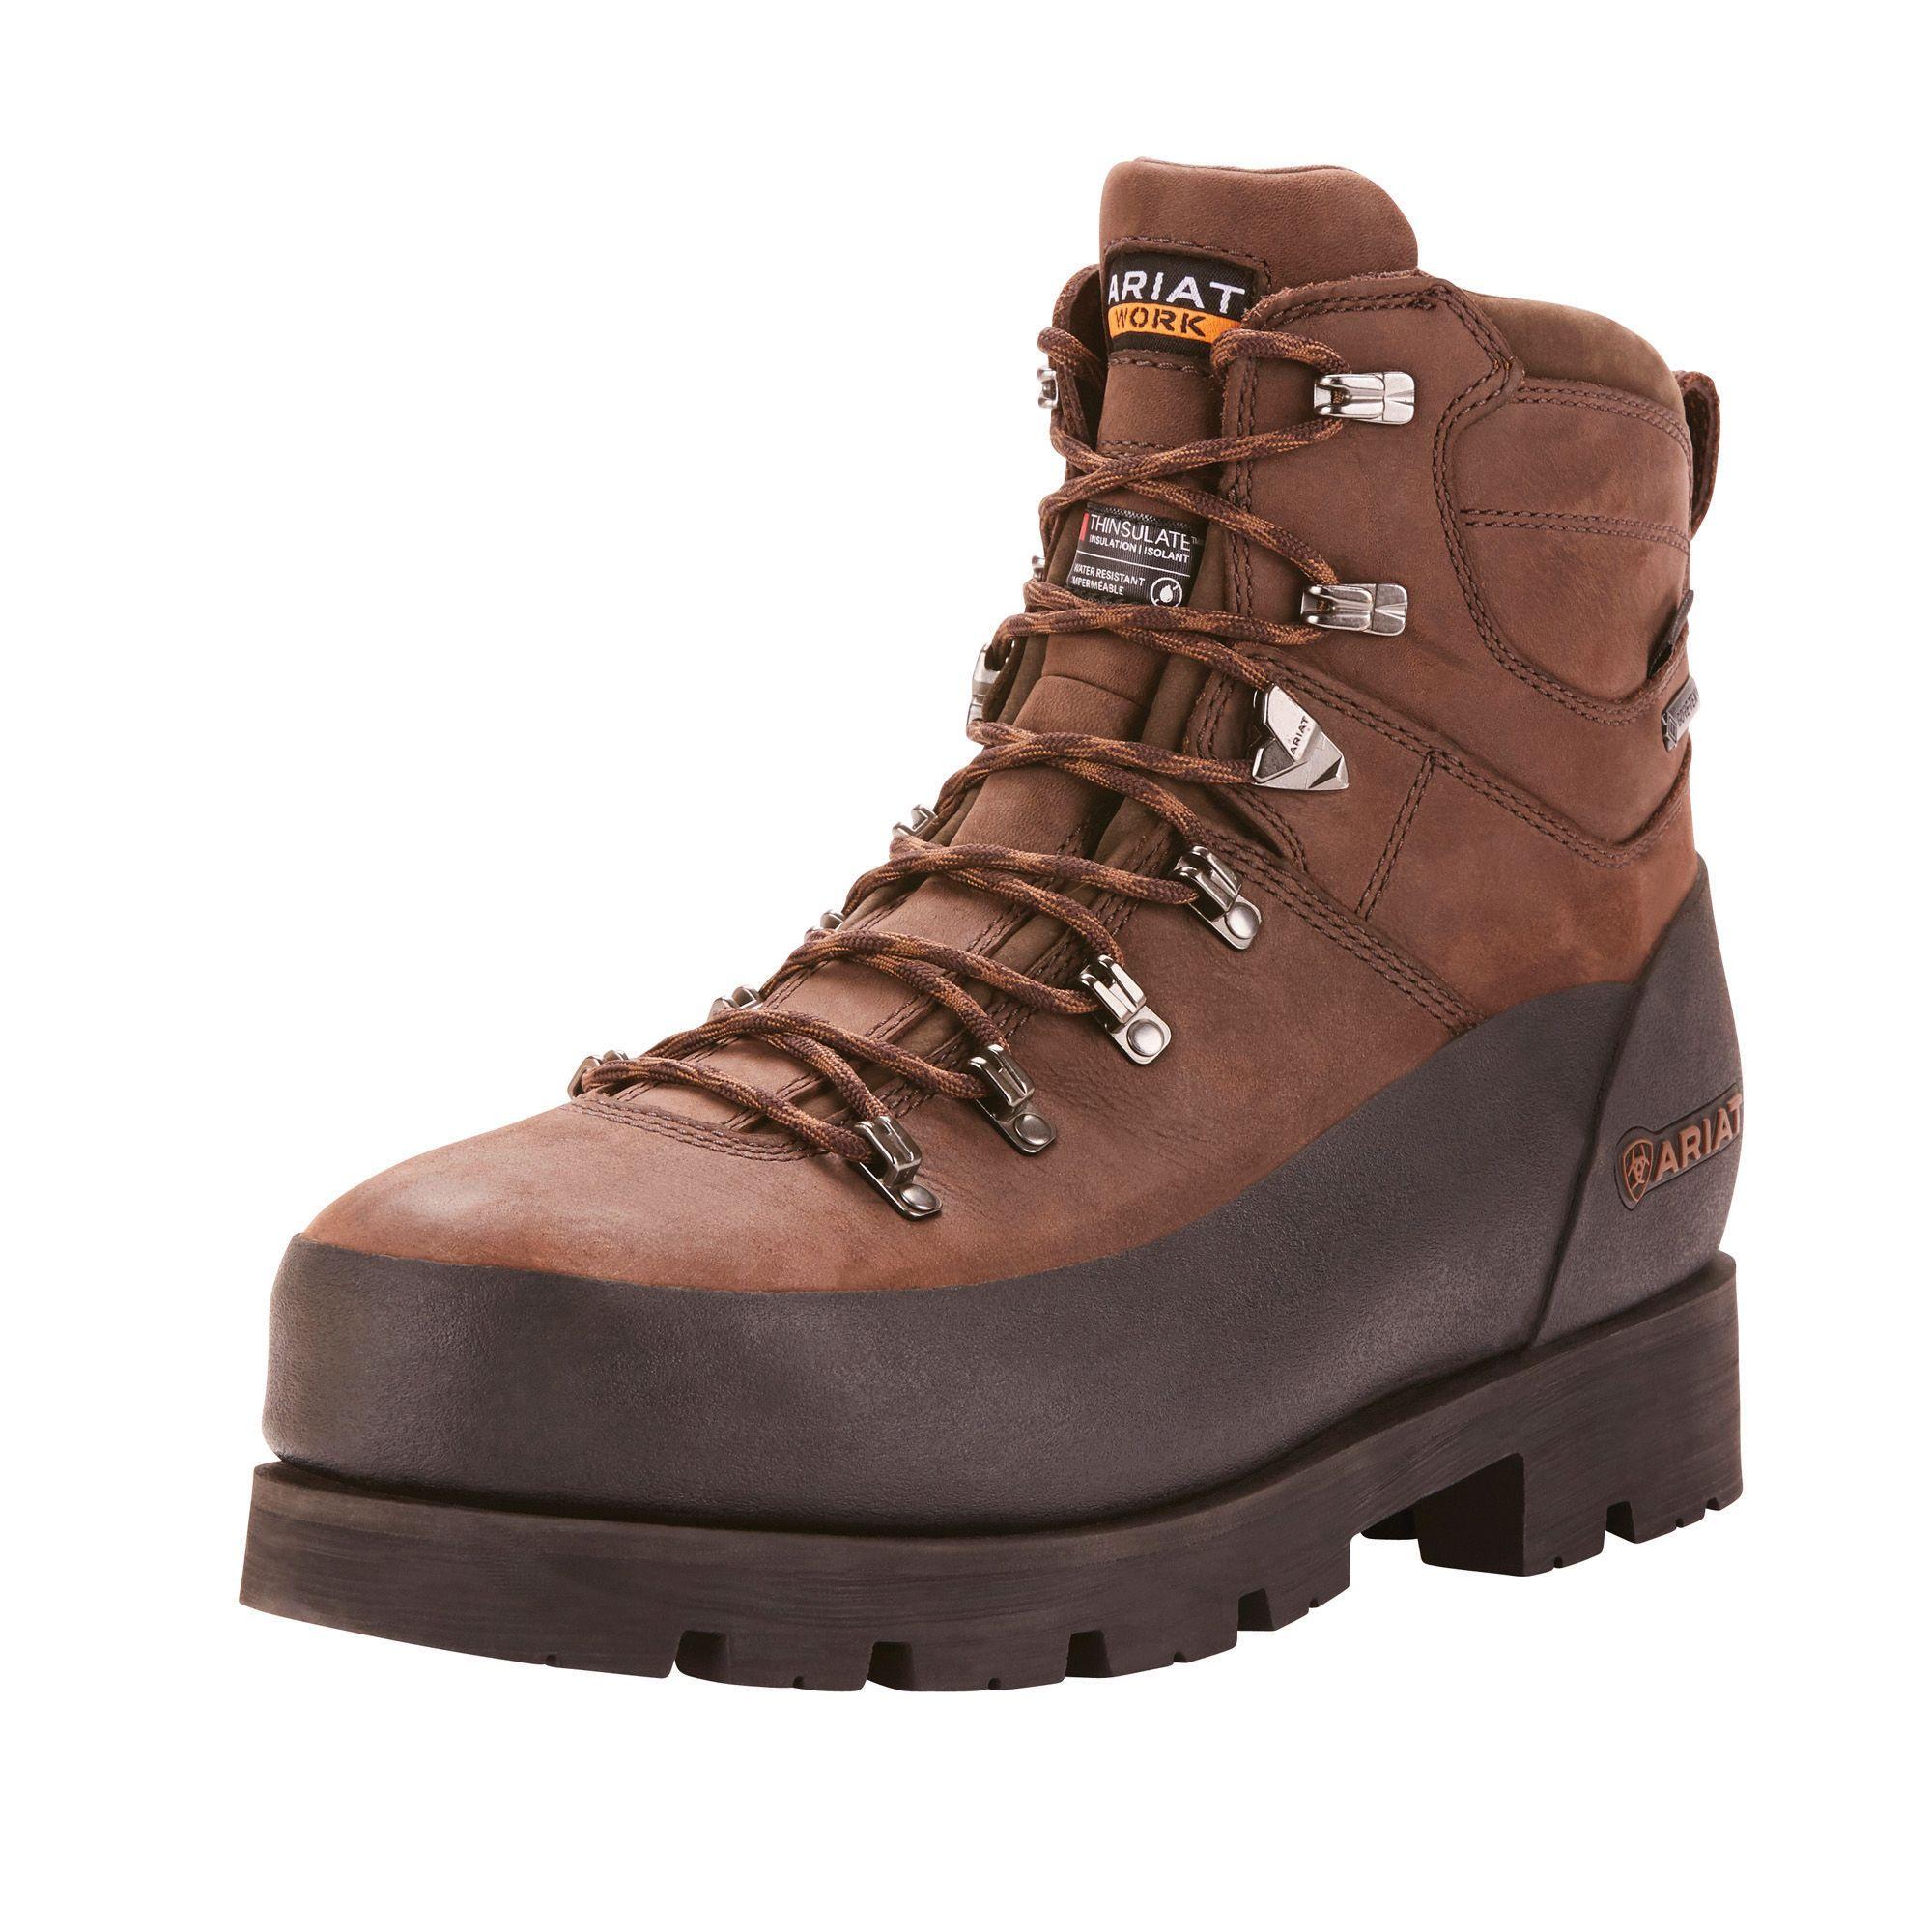 Linesman Ridge 6 Gore Tex 400g Composite Toe Work Boot Composite Toe Work Boots Boots Work Boots